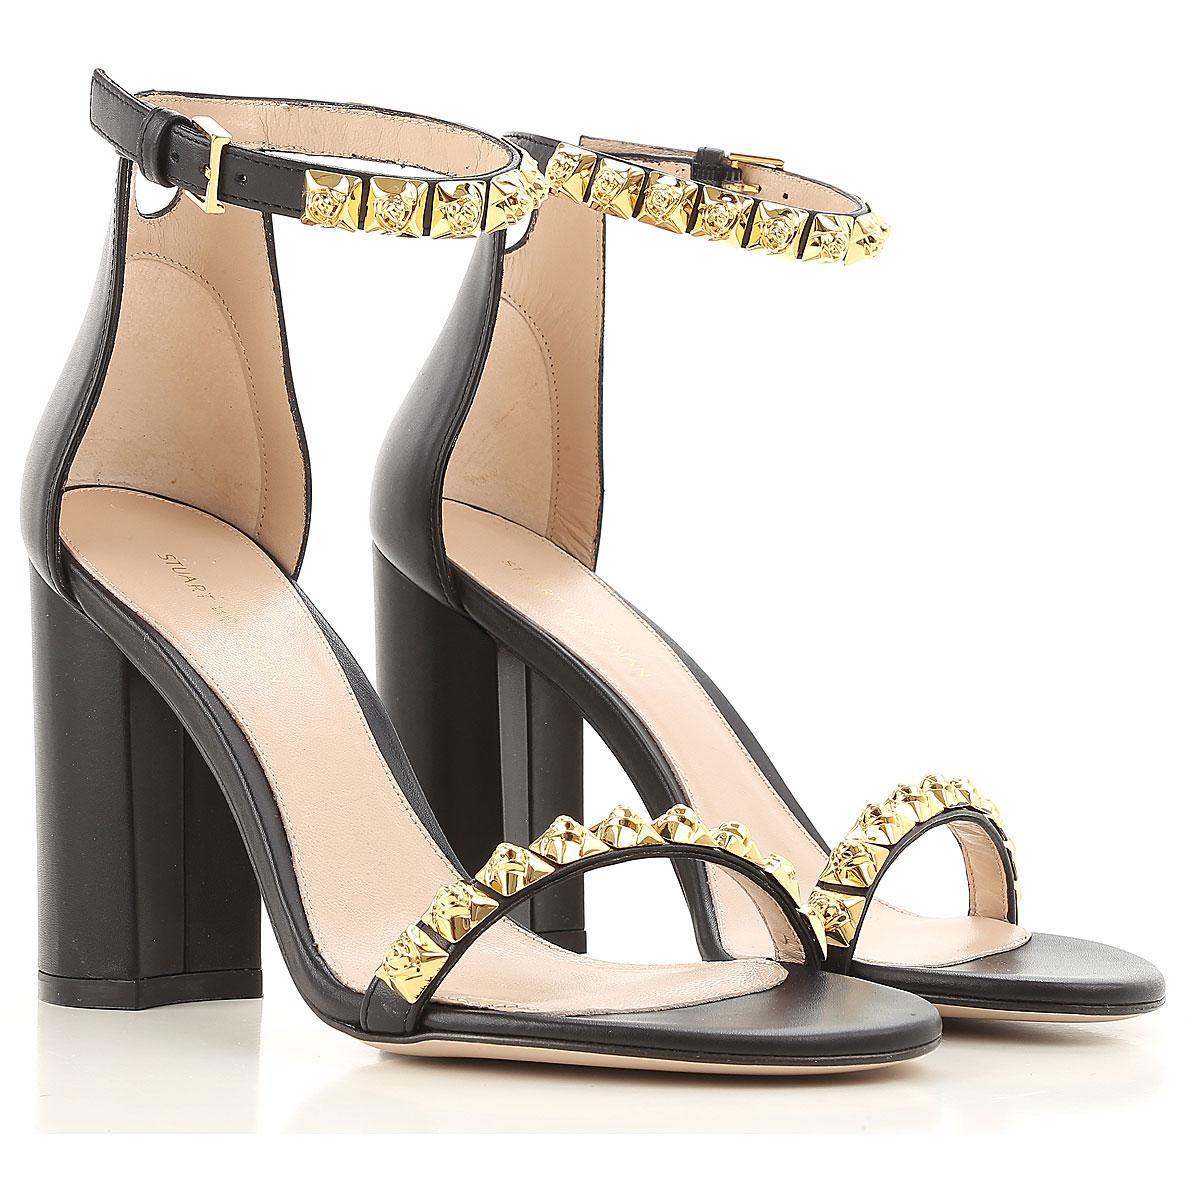 b47658eb76e Lyst - Stuart Weitzman Shoes For Women